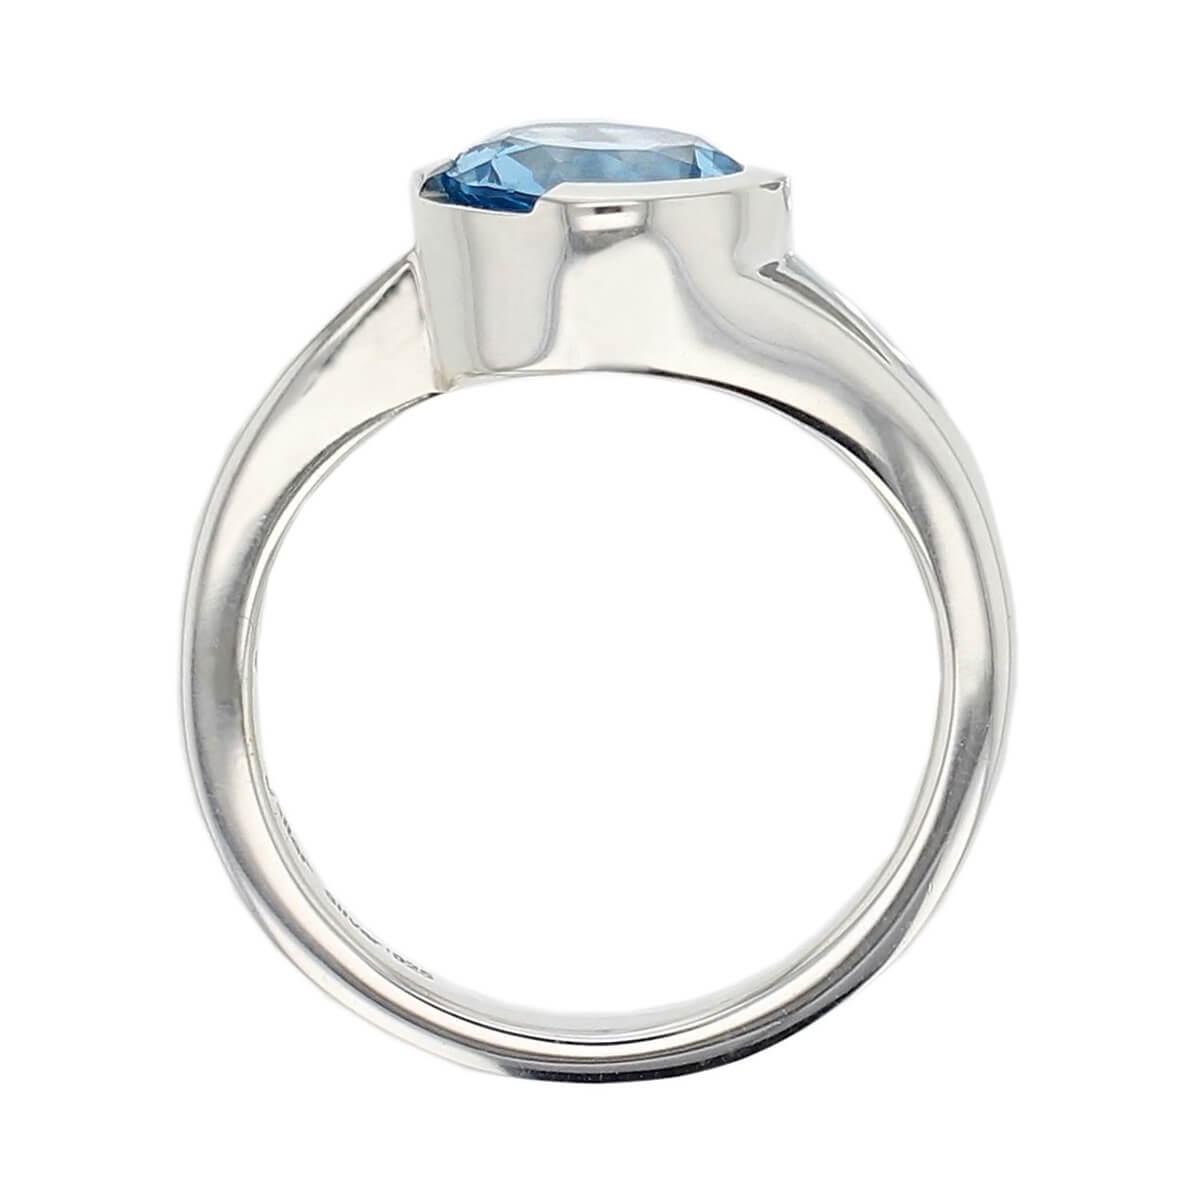 sterling silver blue round cut topaz gemstone dress ring, designer jewellery, gem, jewelry, handmade by Faller, Londonderry, Northern Ireland, Irish hand crafted, darcy, D'arcy